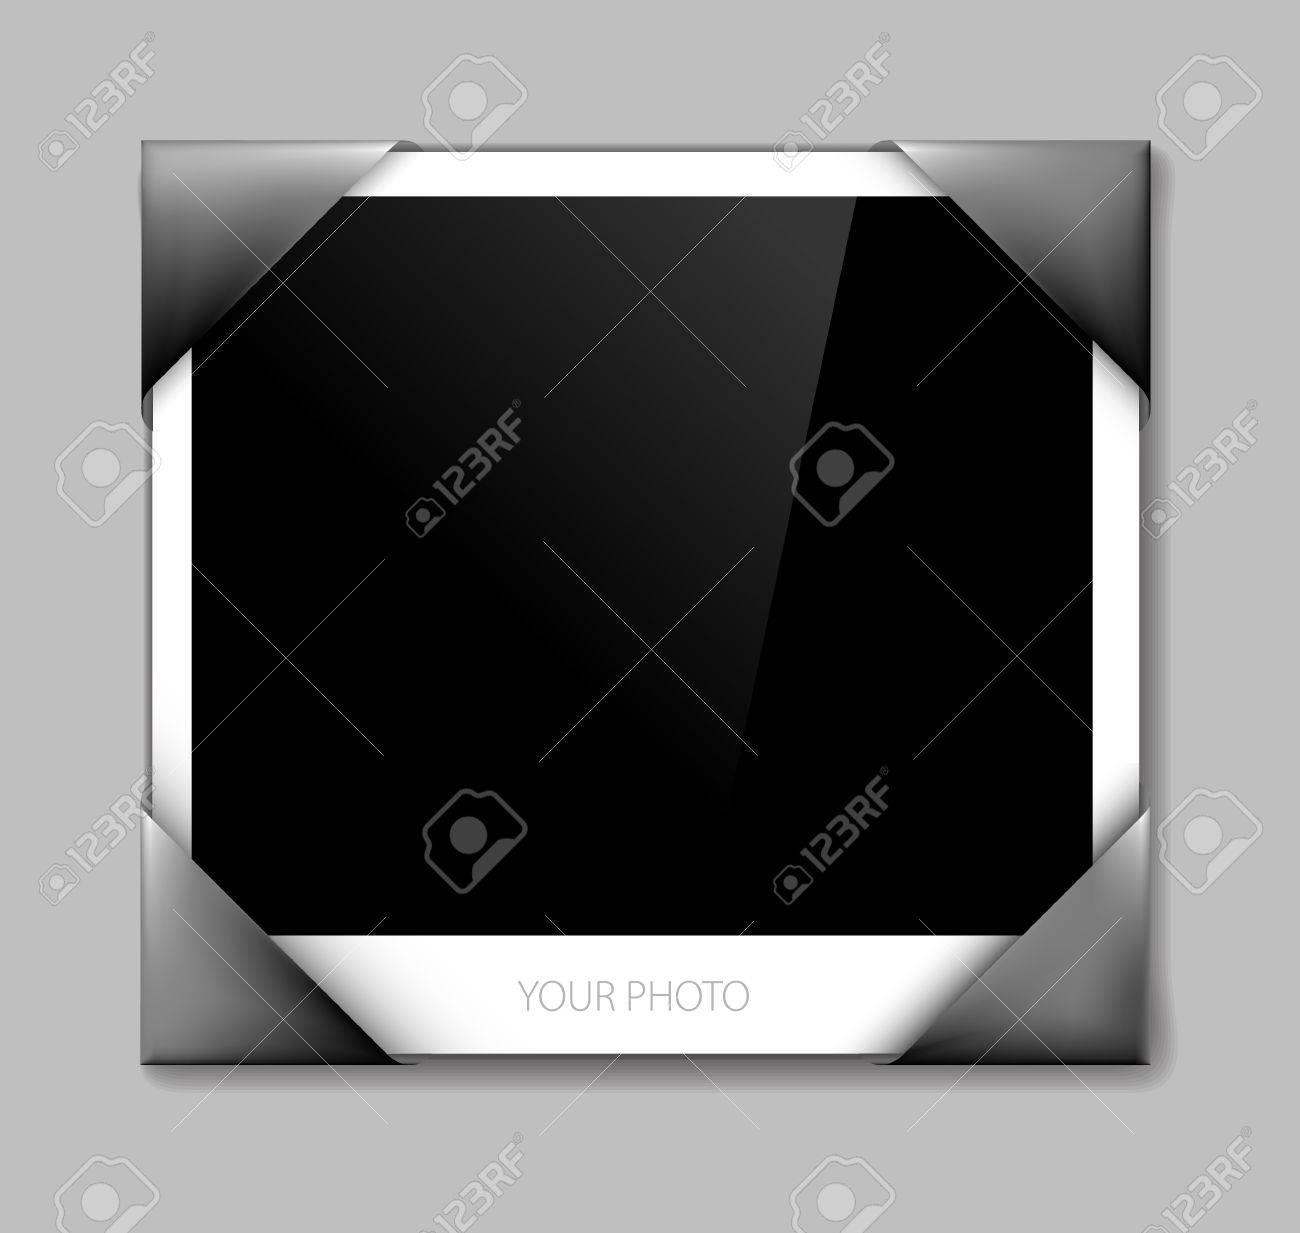 Empty photo in photo holder - vector illustration Stock Vector - 9930946